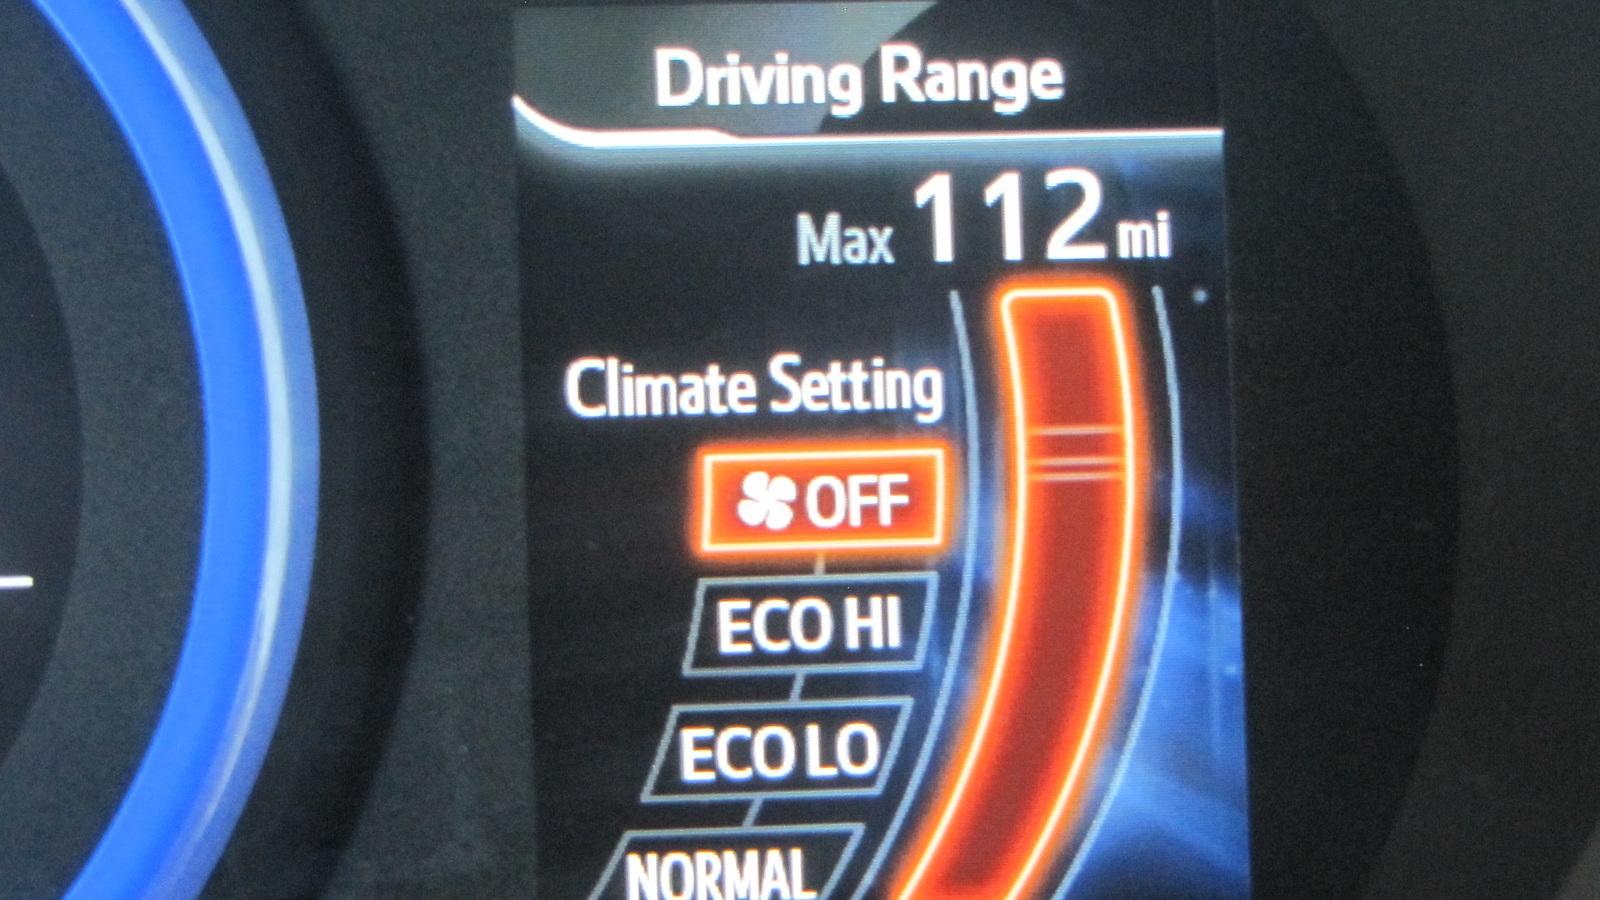 2012 Toyota RAV4 EV, Newport Beach, California, July 2012